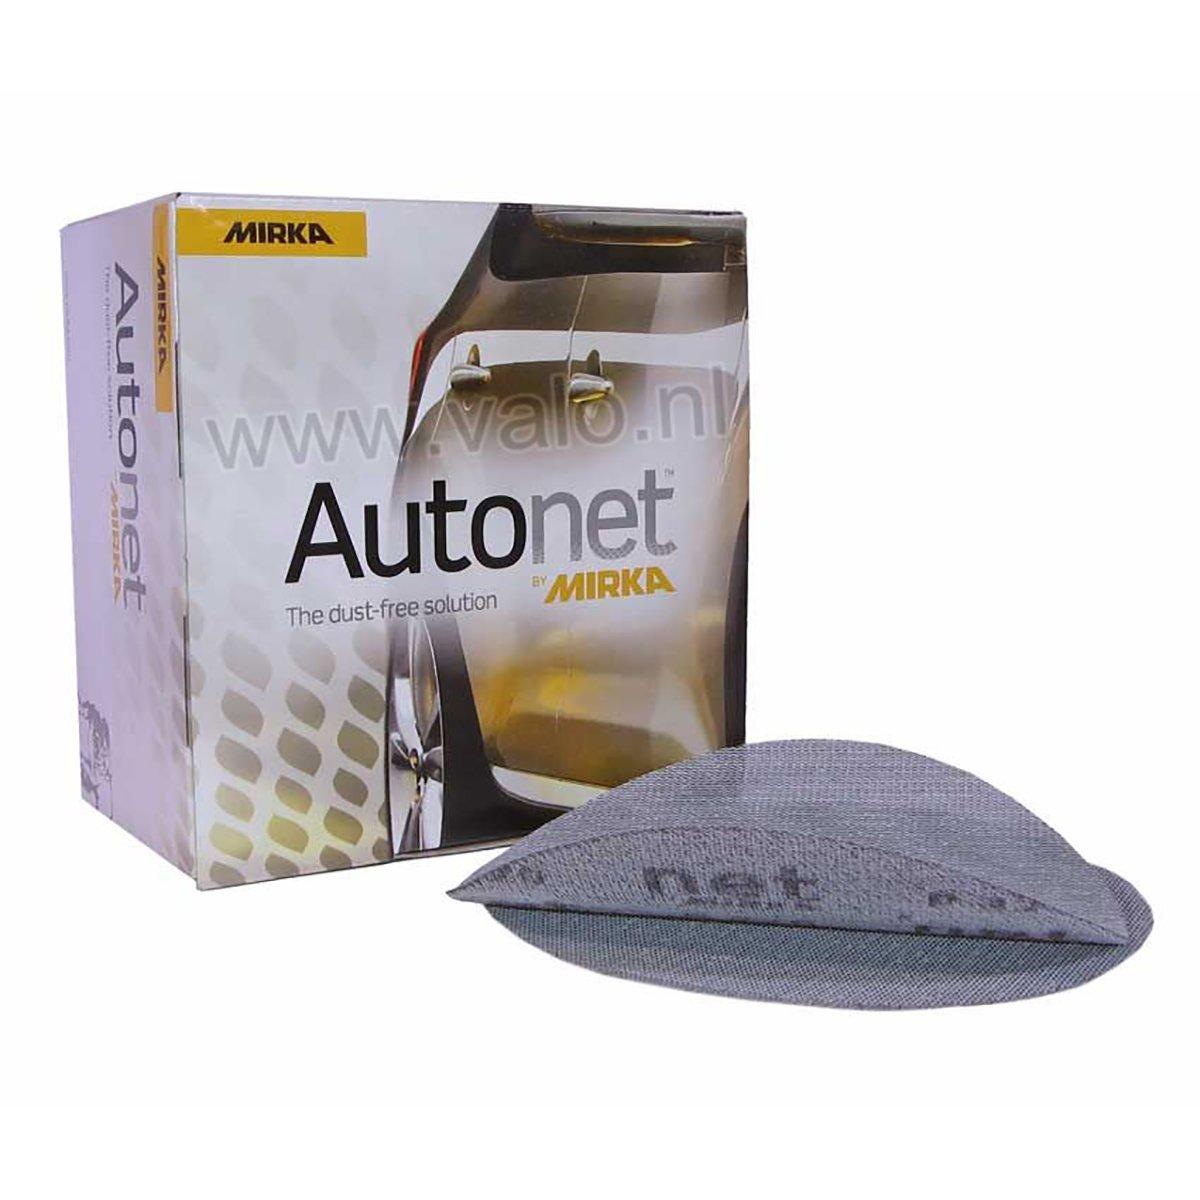 Mirka Autonet AE23205051 - 500 Grit - 5 Inch - Wet/Dry Mesh Sanding Discs - 50 Pack - Aluminum Oxide - Dust-Free - Automotive or Woodworking